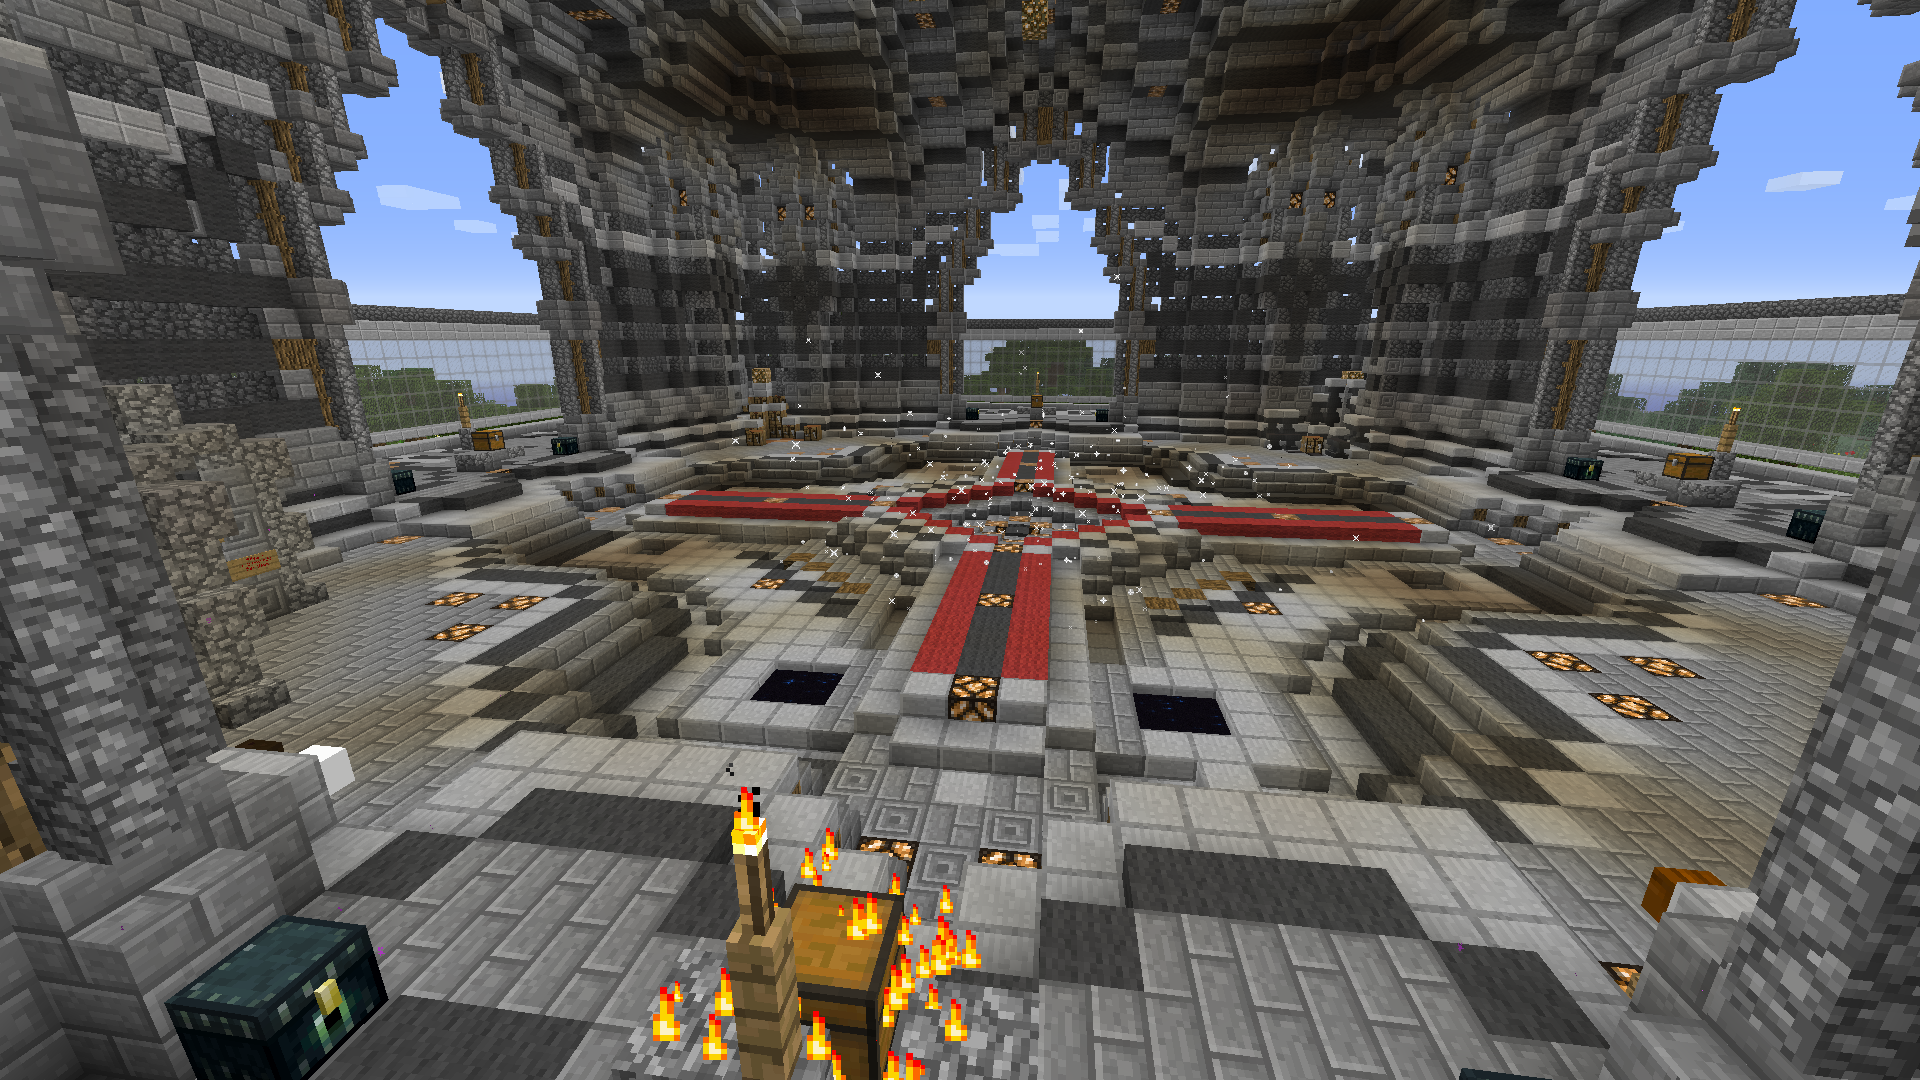 Mysticpvpmc Pvp Factions Server Pc Servers Servers Java Edition Minecraft Forum Minecraft Forum